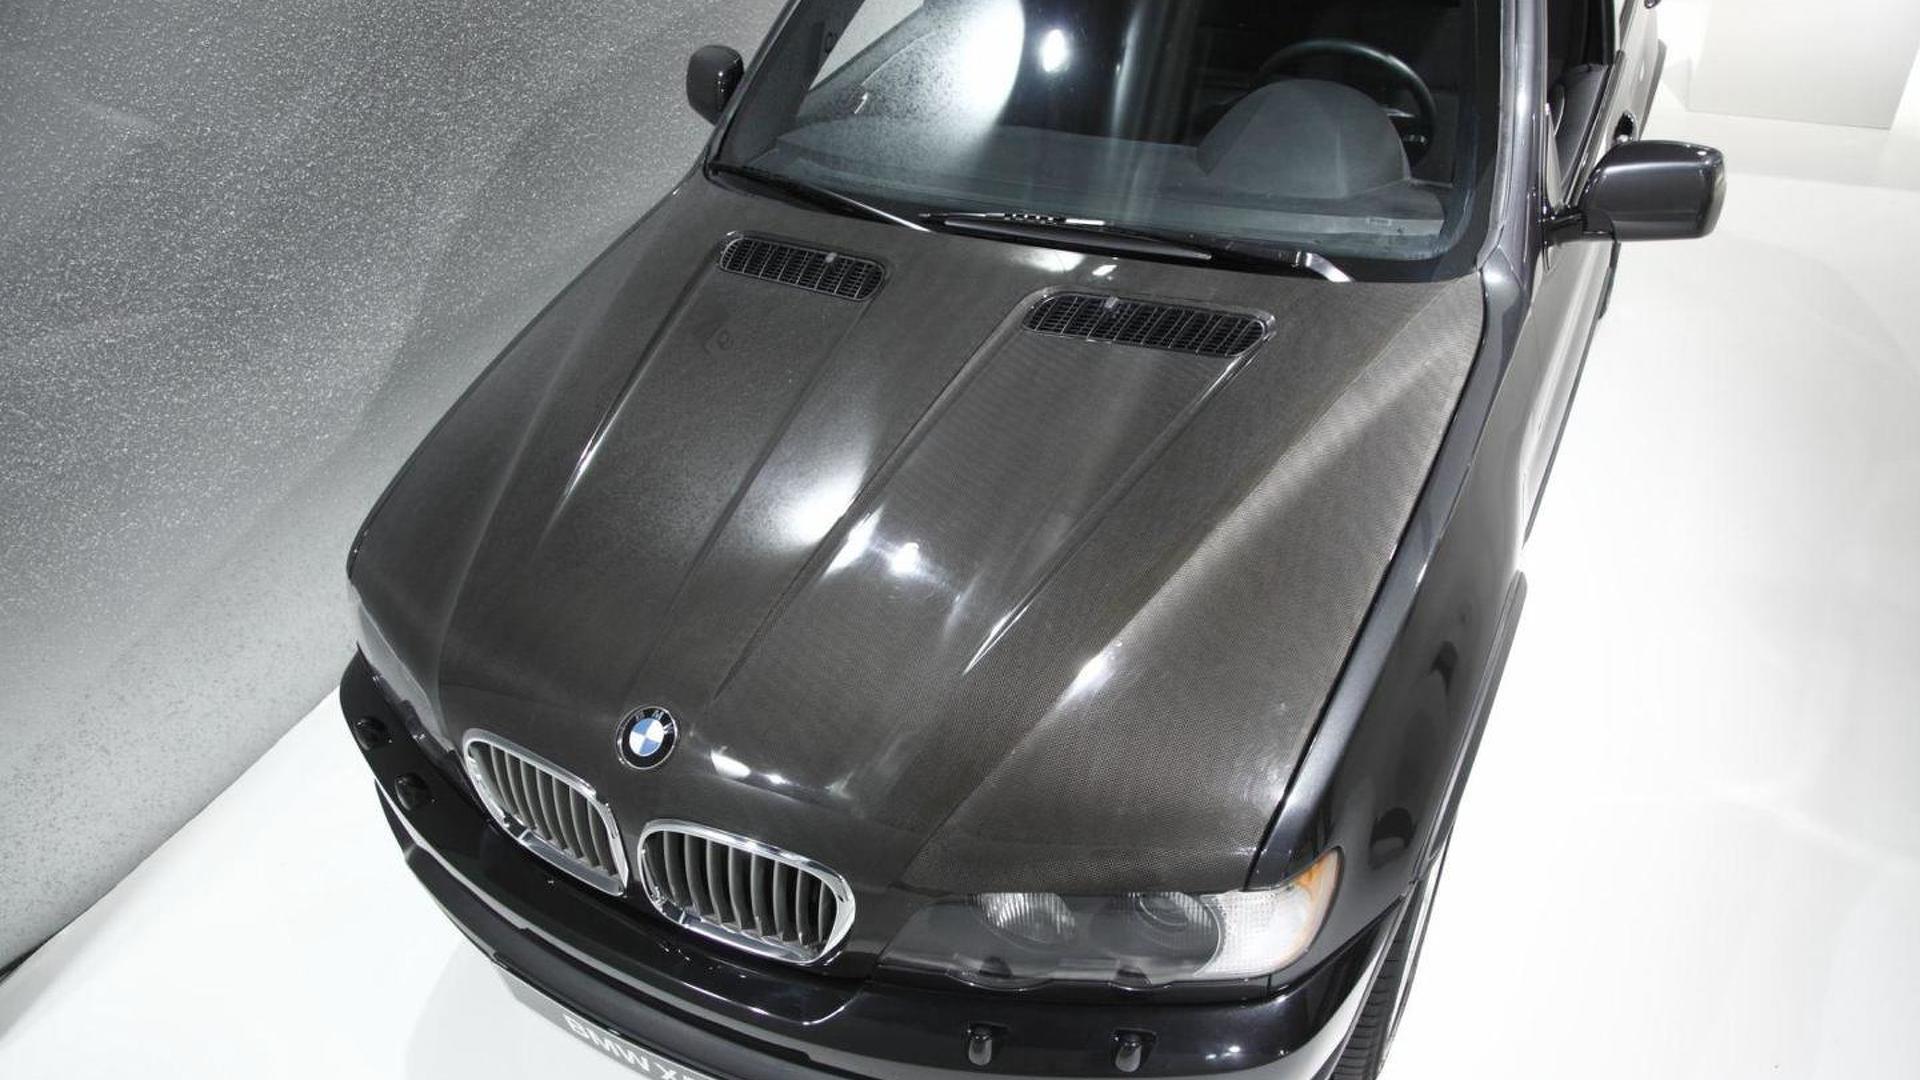 Secret BMW X5 protoype made of carbon fiber uncovered